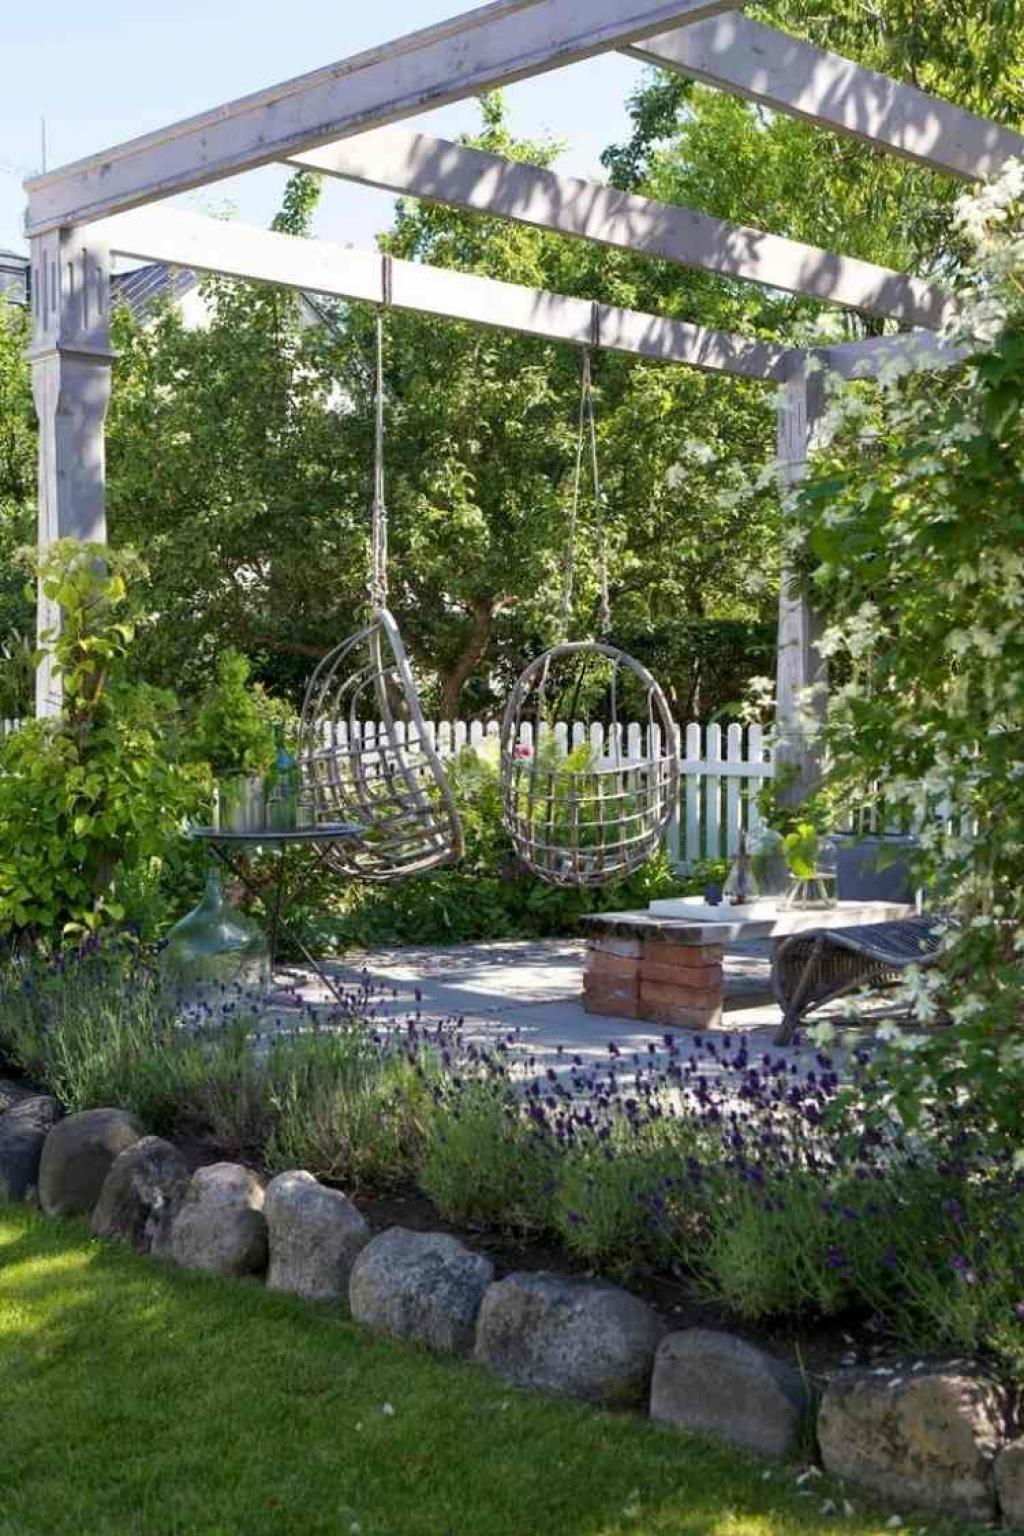 aménager un coin détente au jardin   magickalfantasy